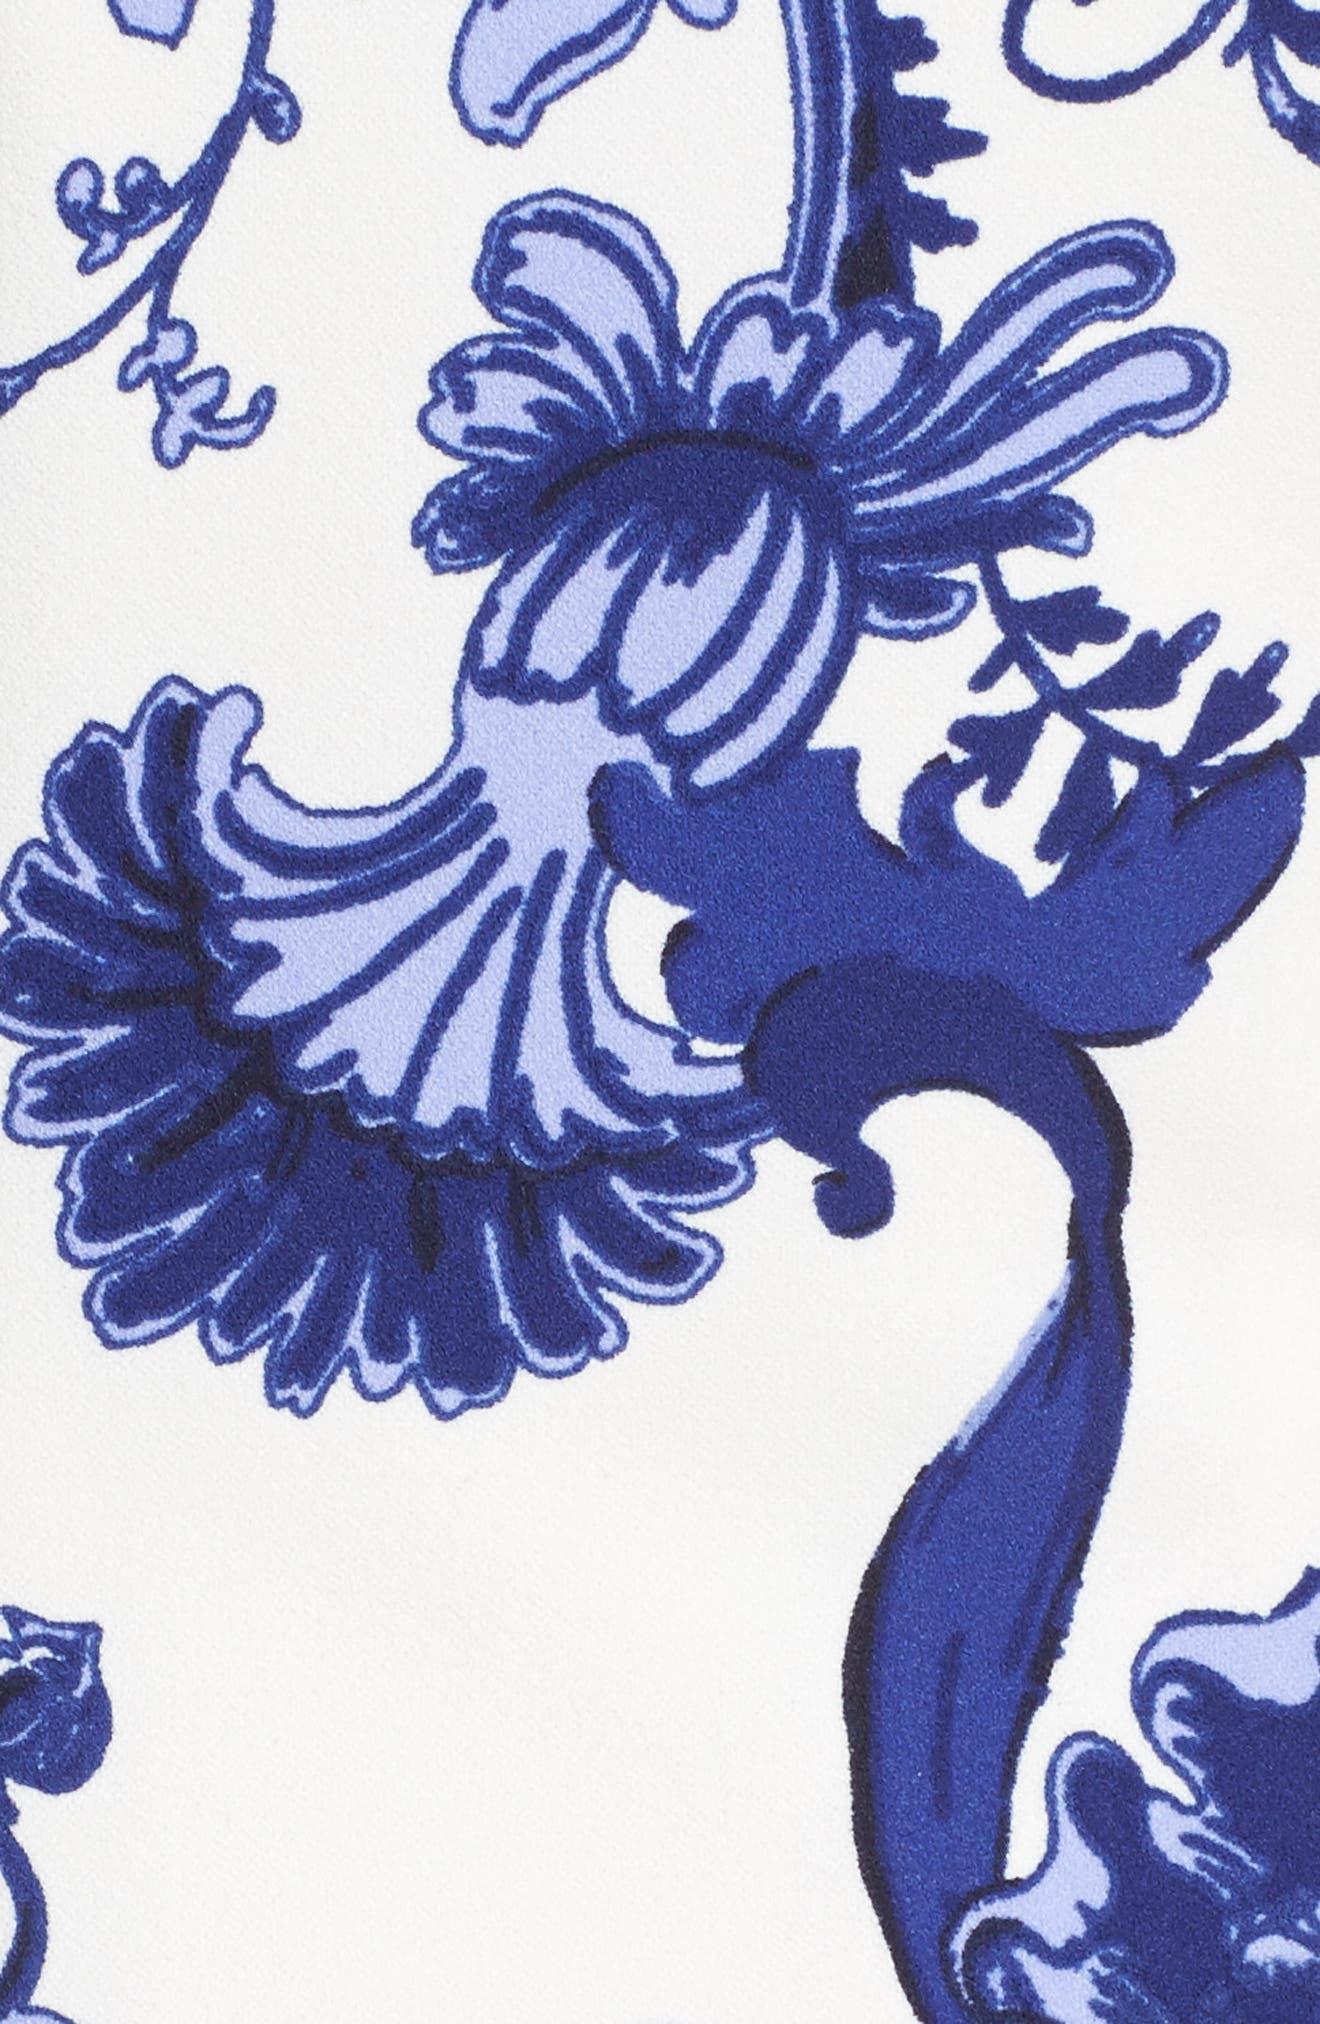 Print Long Sleeve Sheath Dress,                             Alternate thumbnail 5, color,                             421